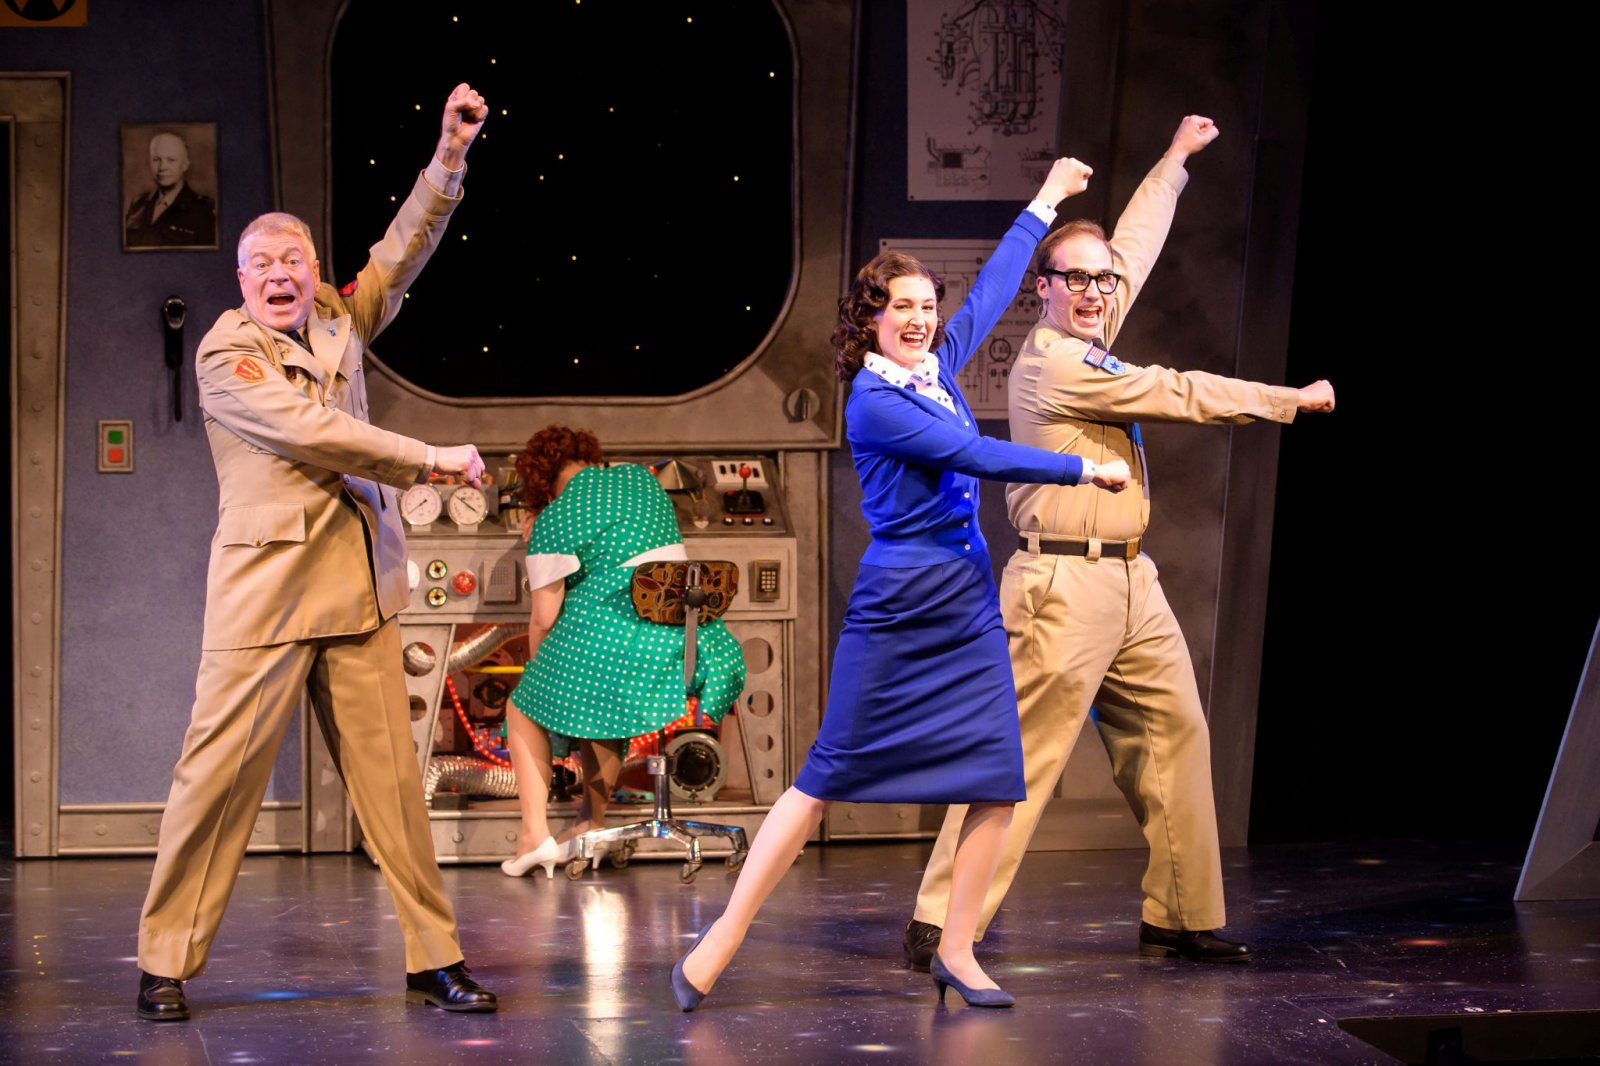 Norman Moses (Major Malone), Meghan Randolph (Charlene), Kathryn Hausman (Mary Malone) and Matt Frye (Trenton Corbett) in rehearsal for Skylight Music Theatre's Zombies from The Beyondrunning Feb. 2-18.